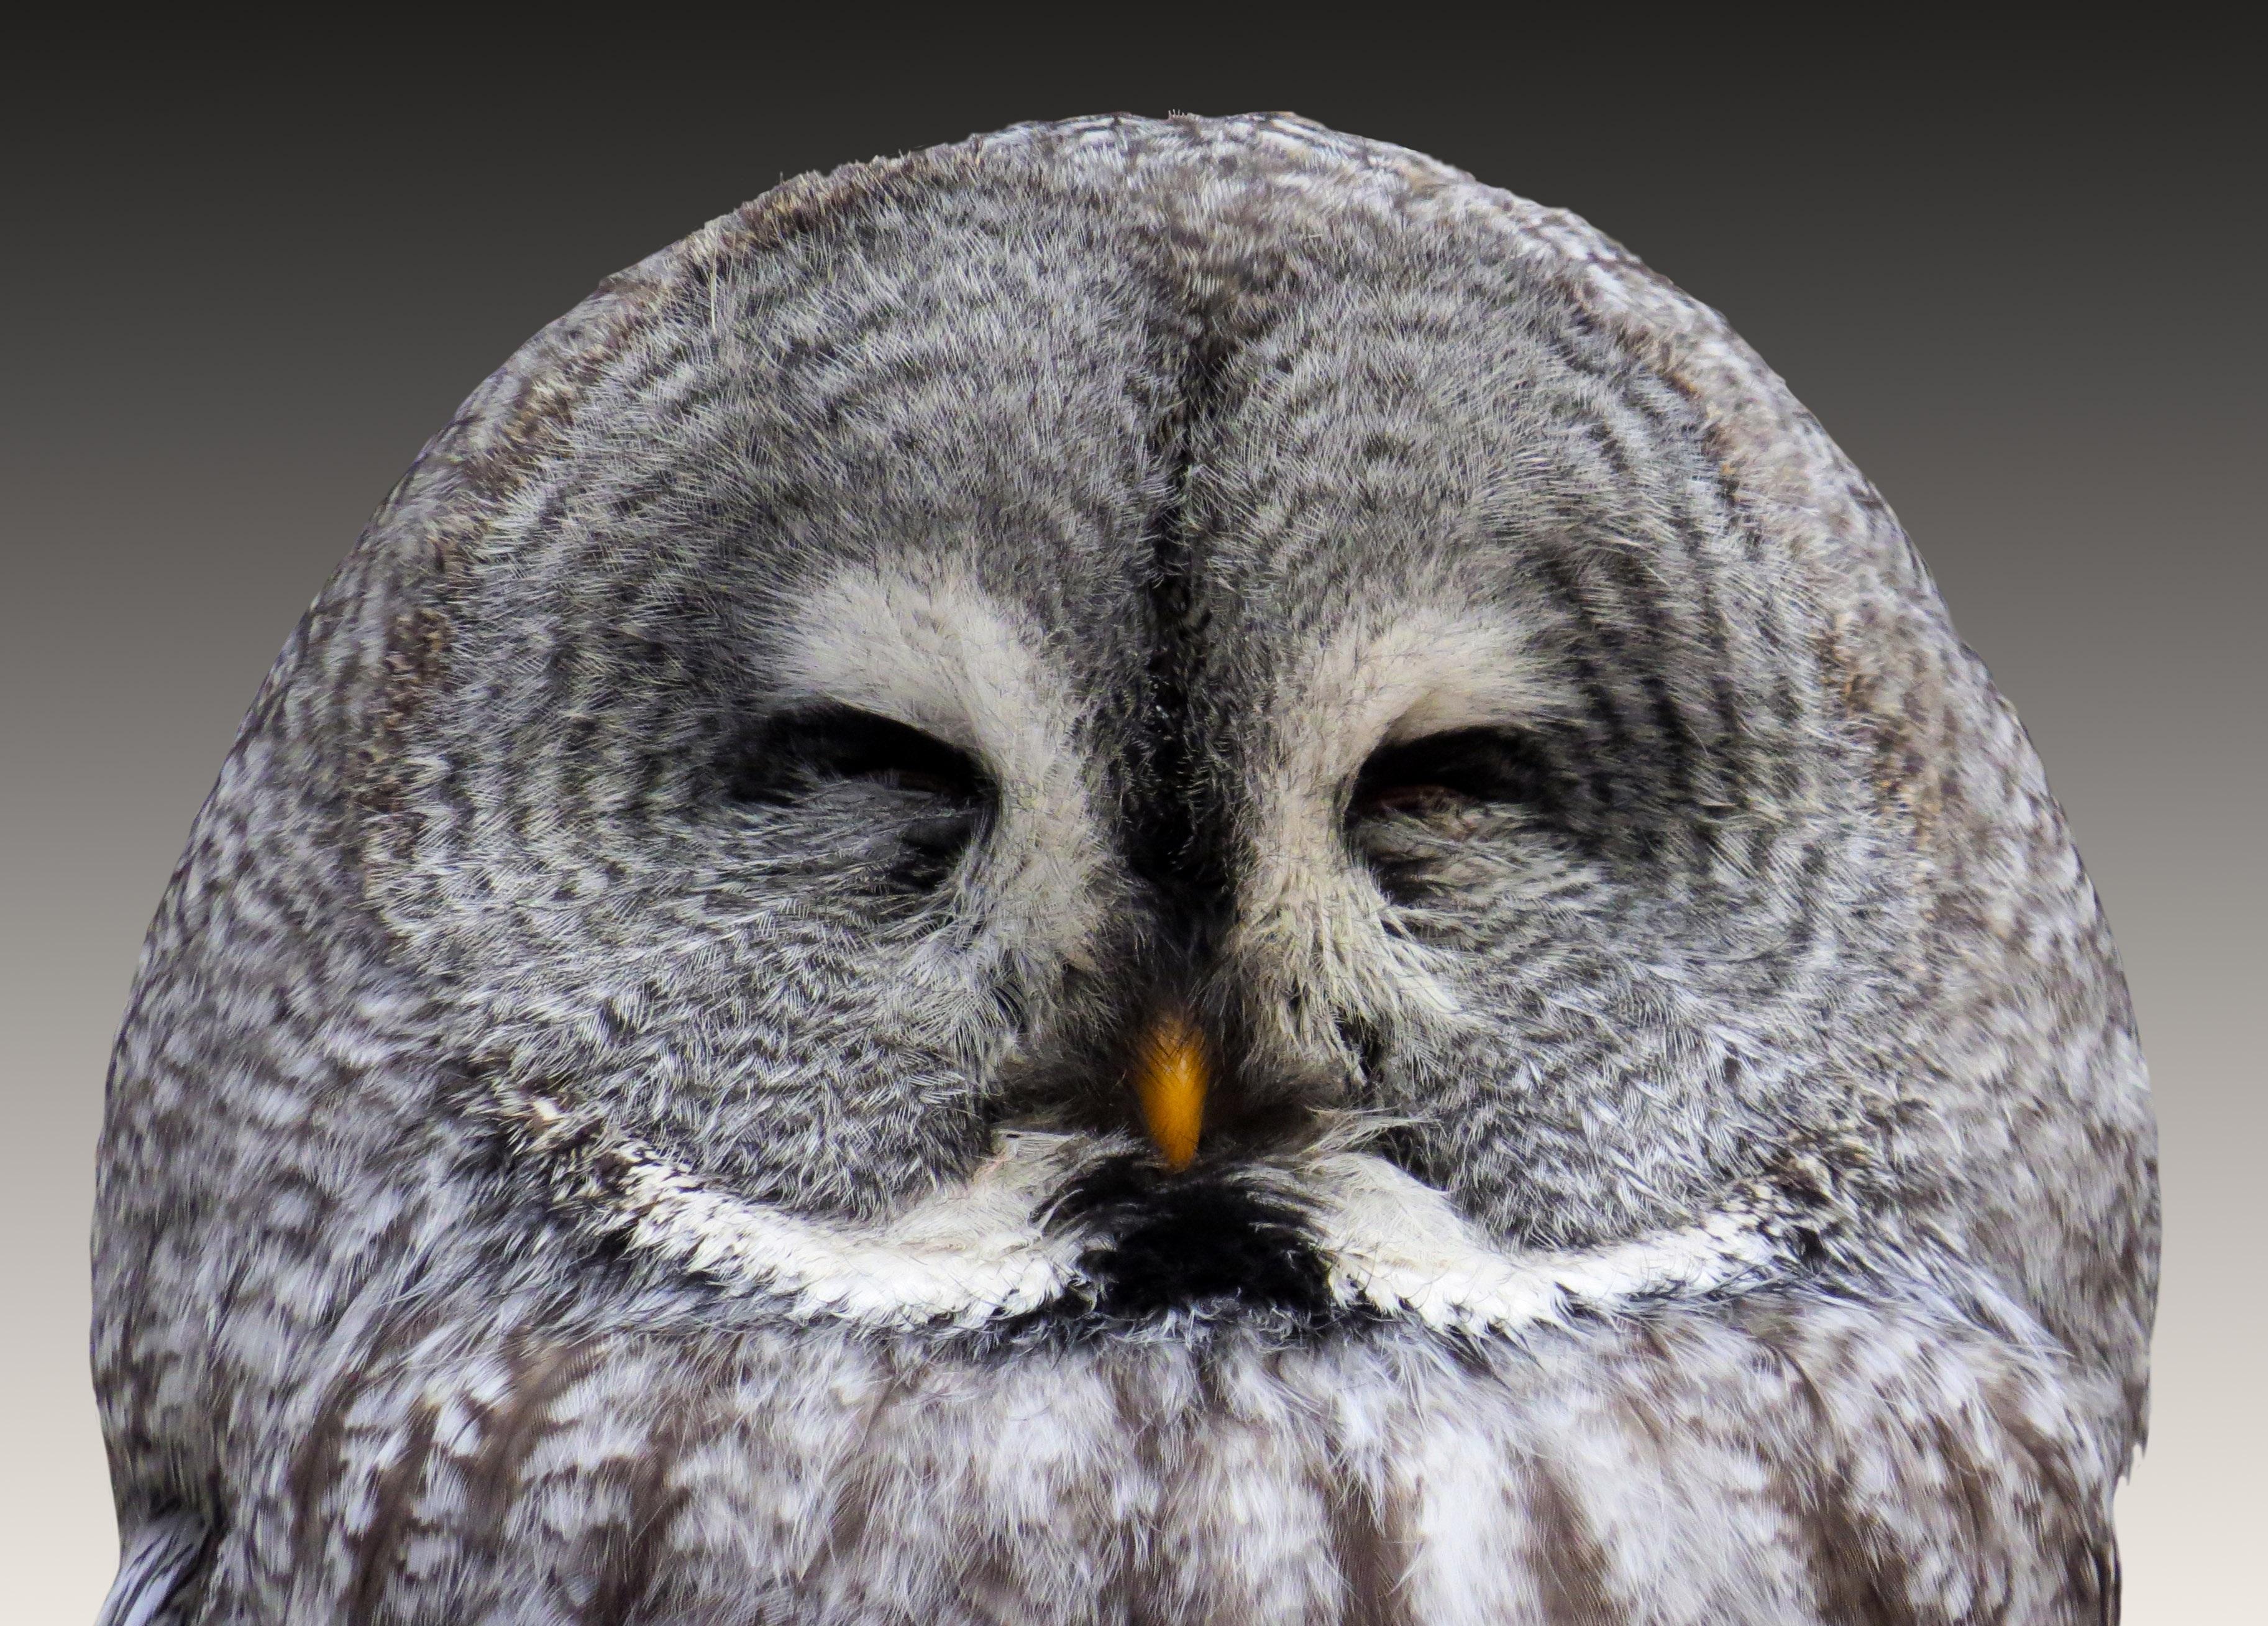 animal-owl-eagle-owl-wisdom-48155